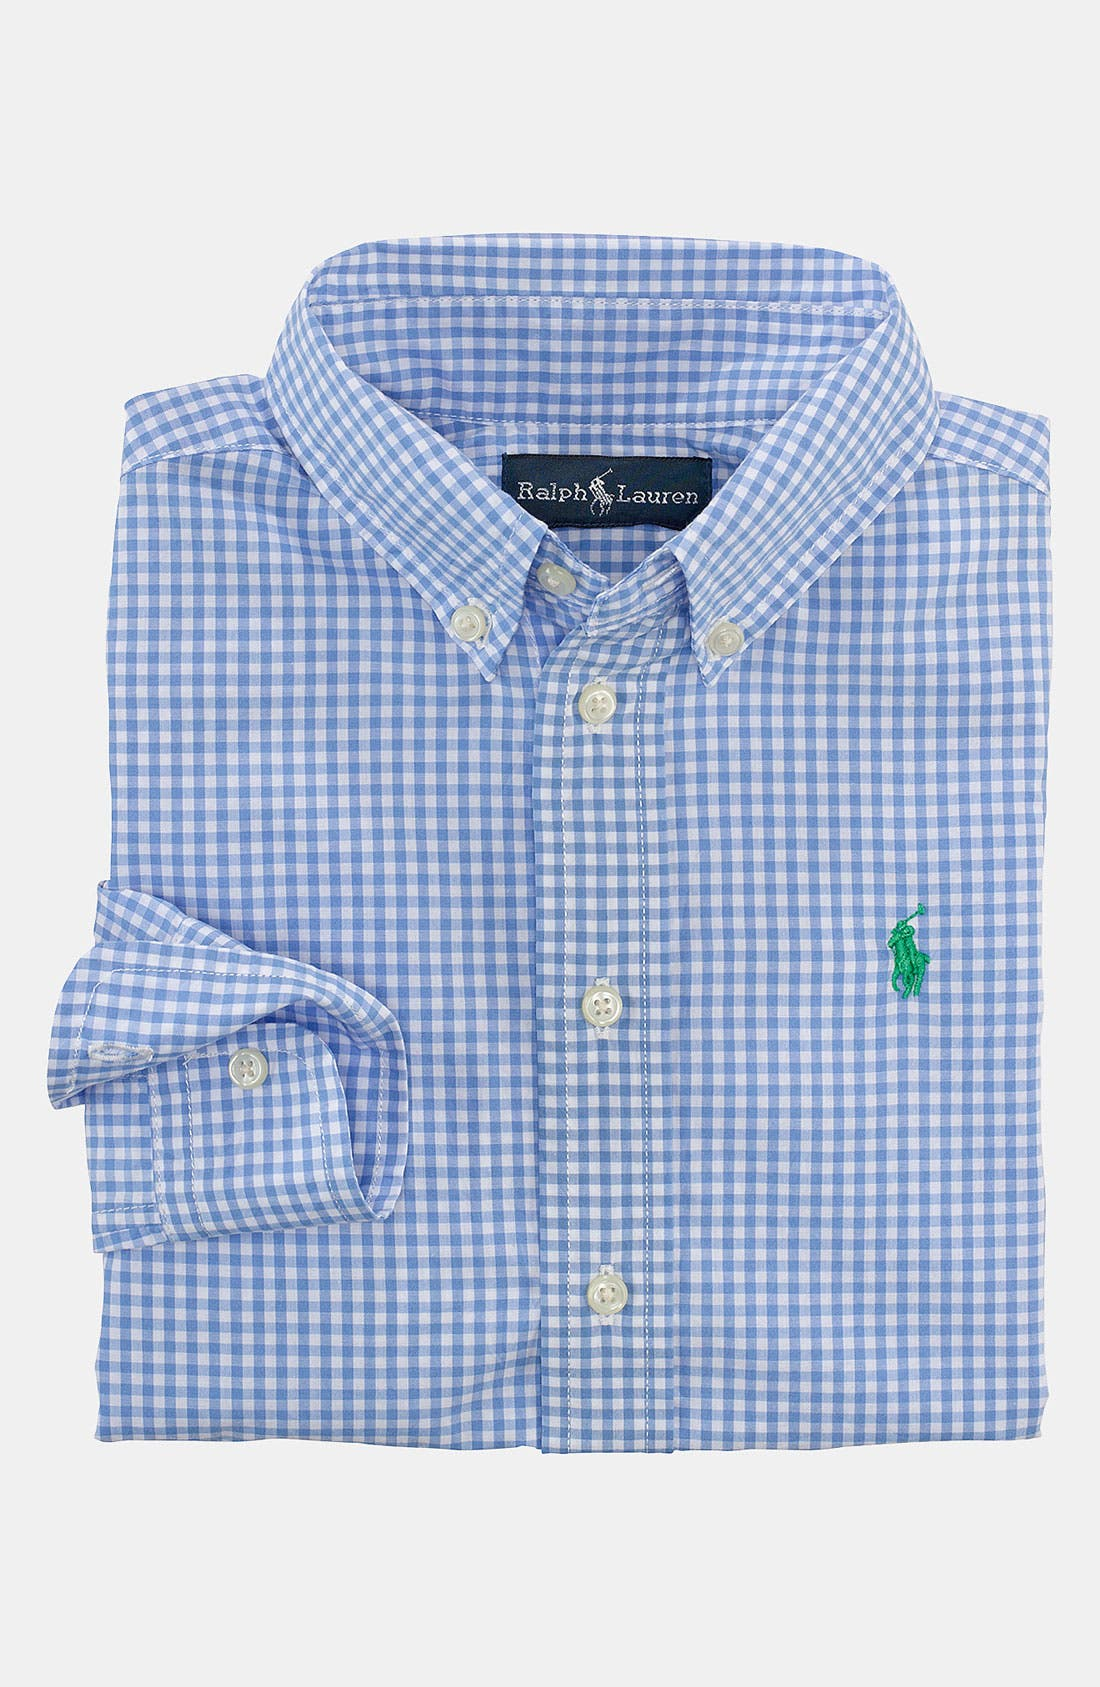 Main Image - Ralph Lauren Gingham Shirt (Toddler)